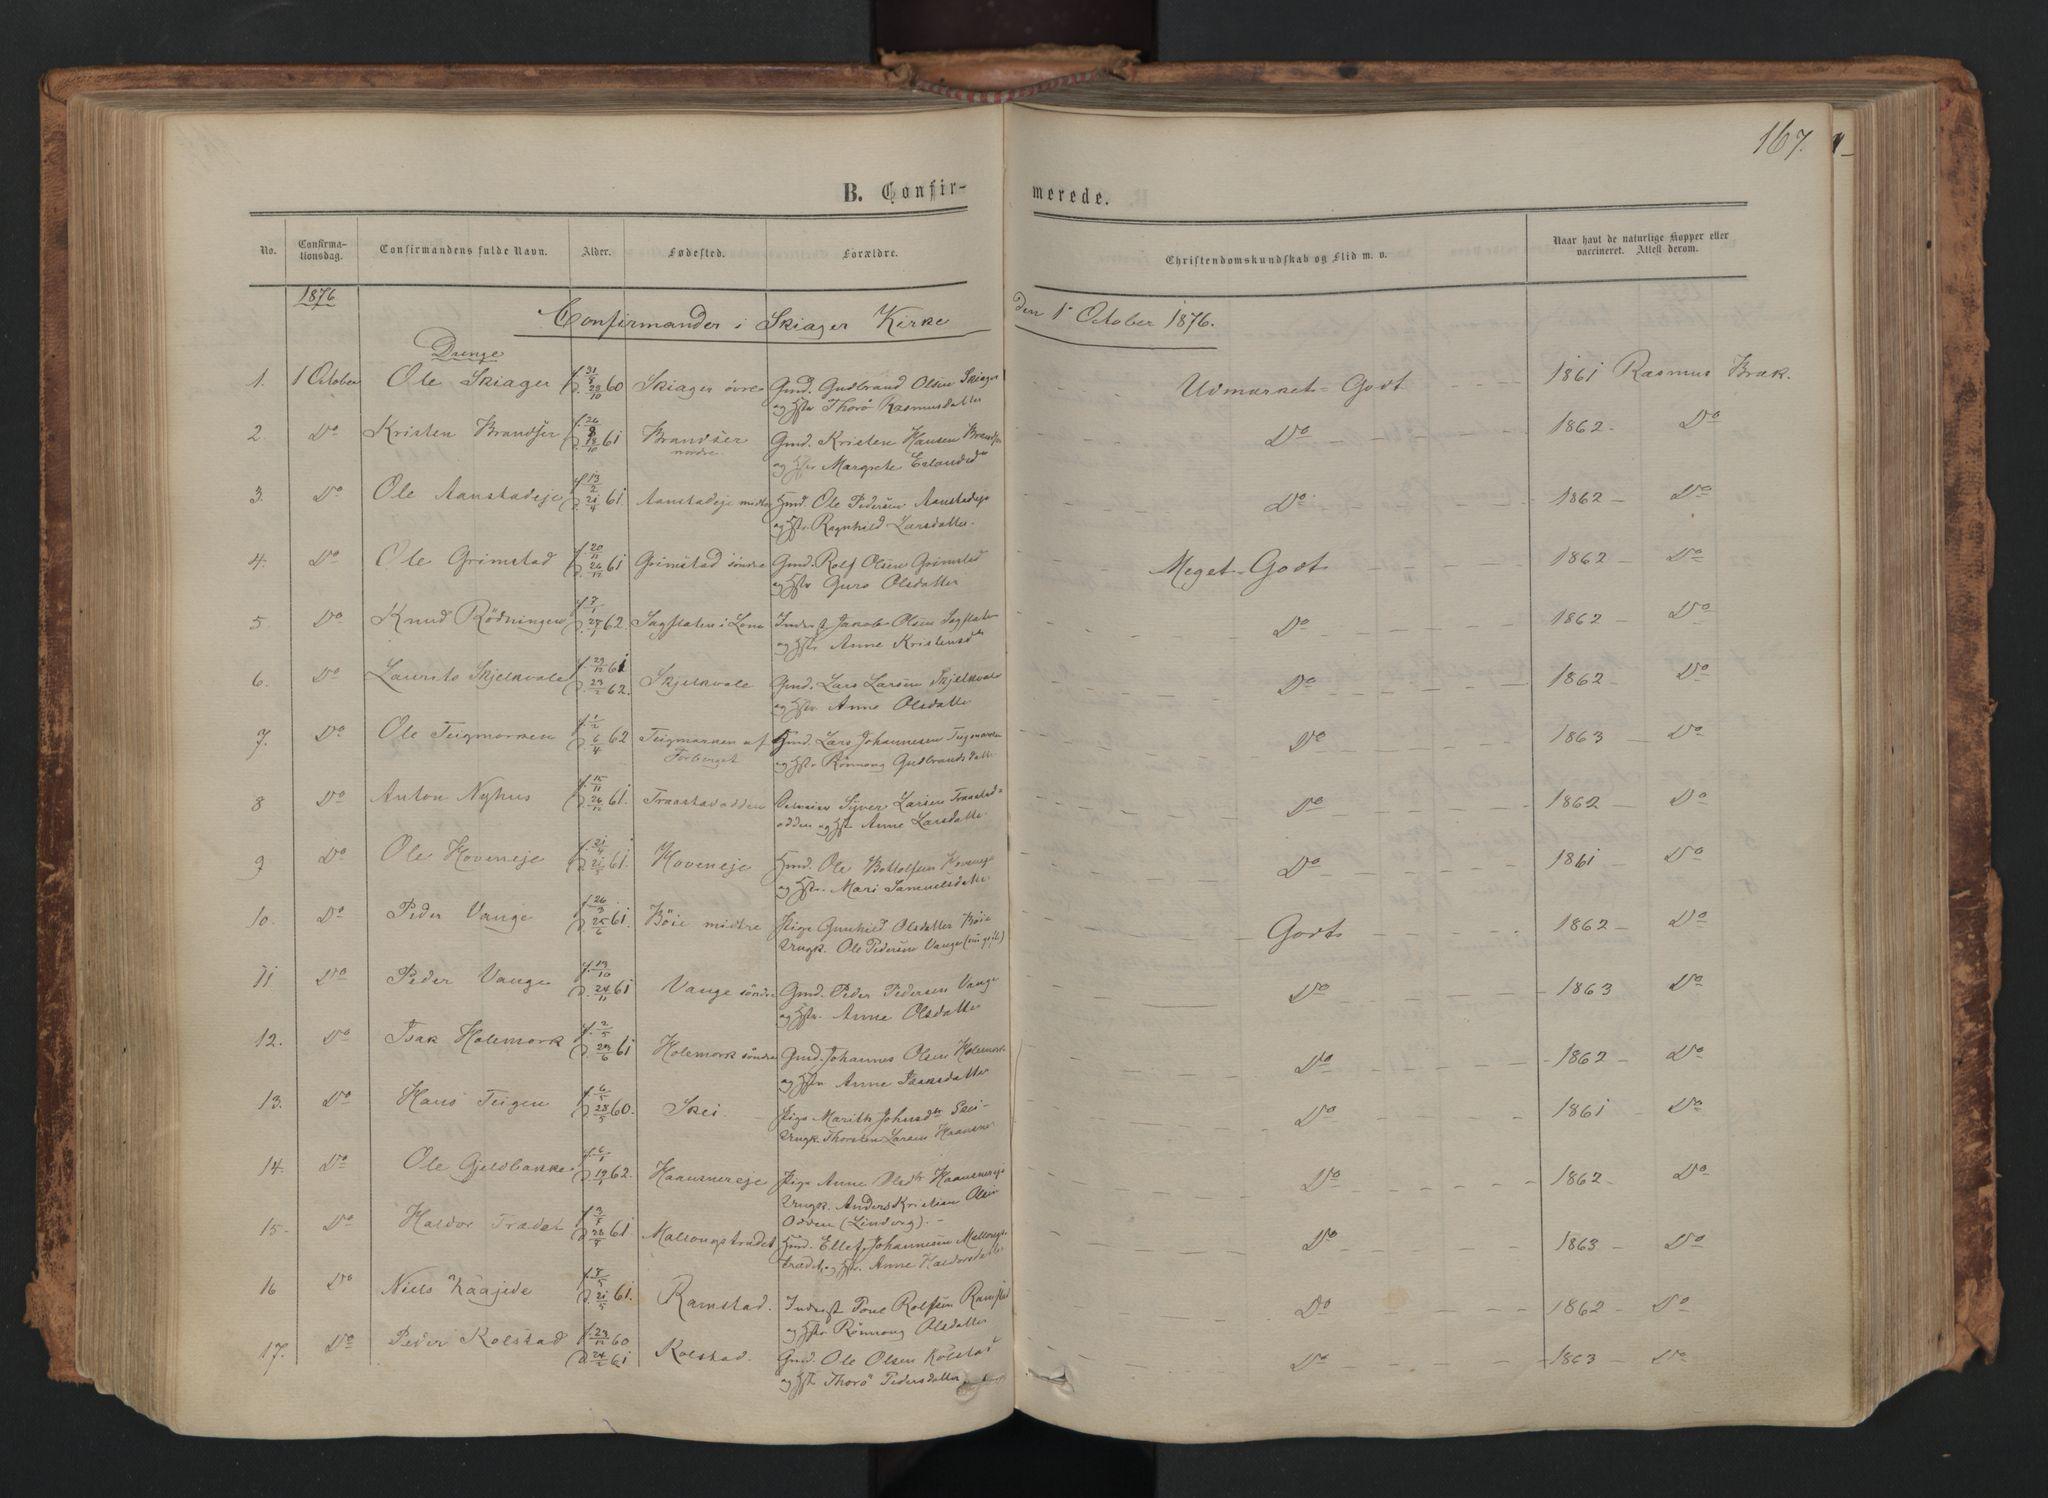 SAH, Skjåk prestekontor, Ministerialbok nr. 1, 1863-1879, s. 167